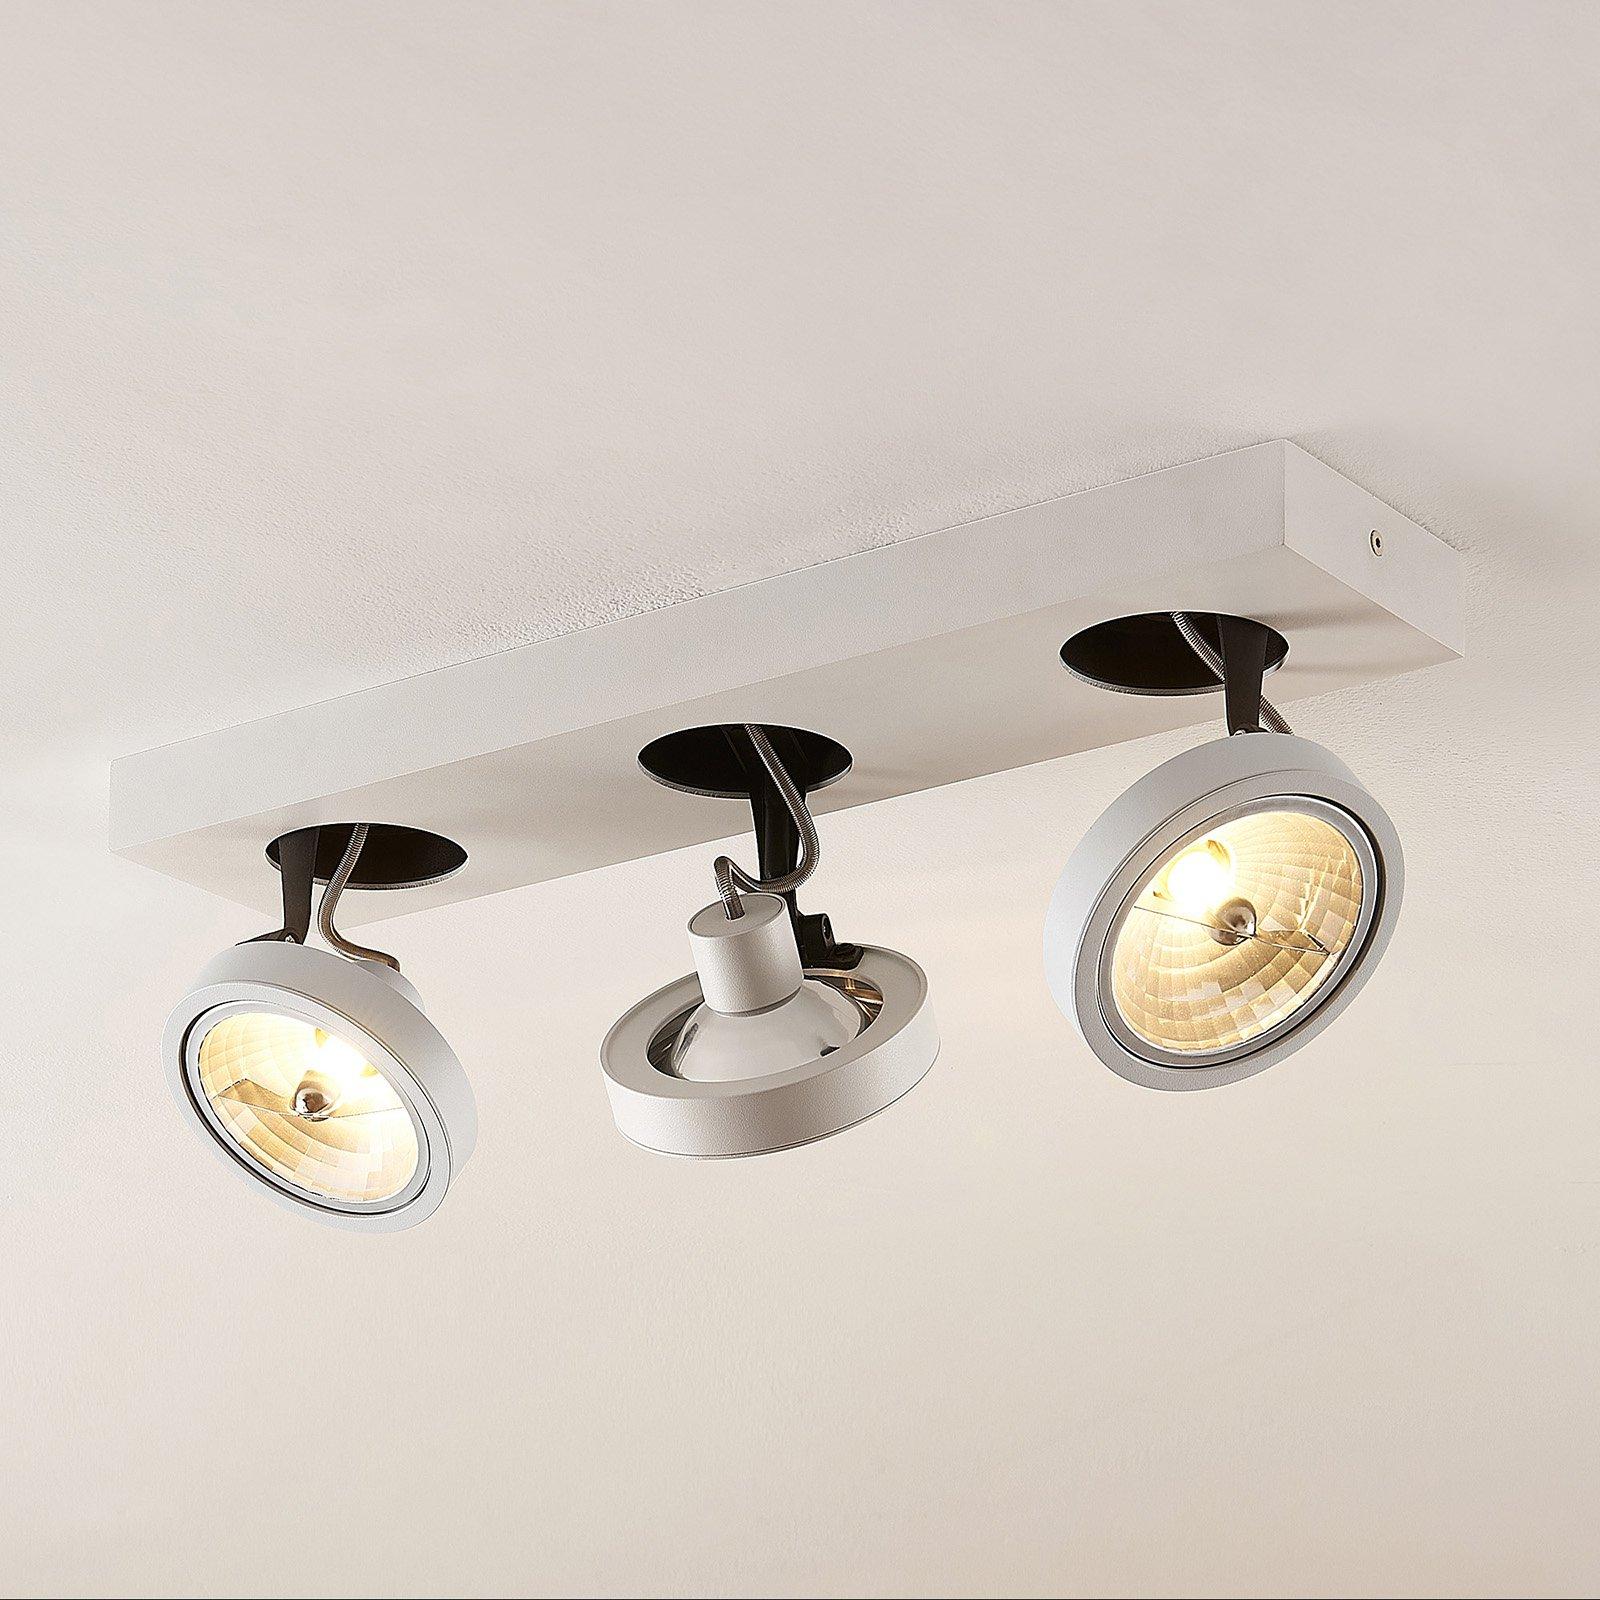 Arcchio Jorvin-taklampe, 3 lyskilder, hvit